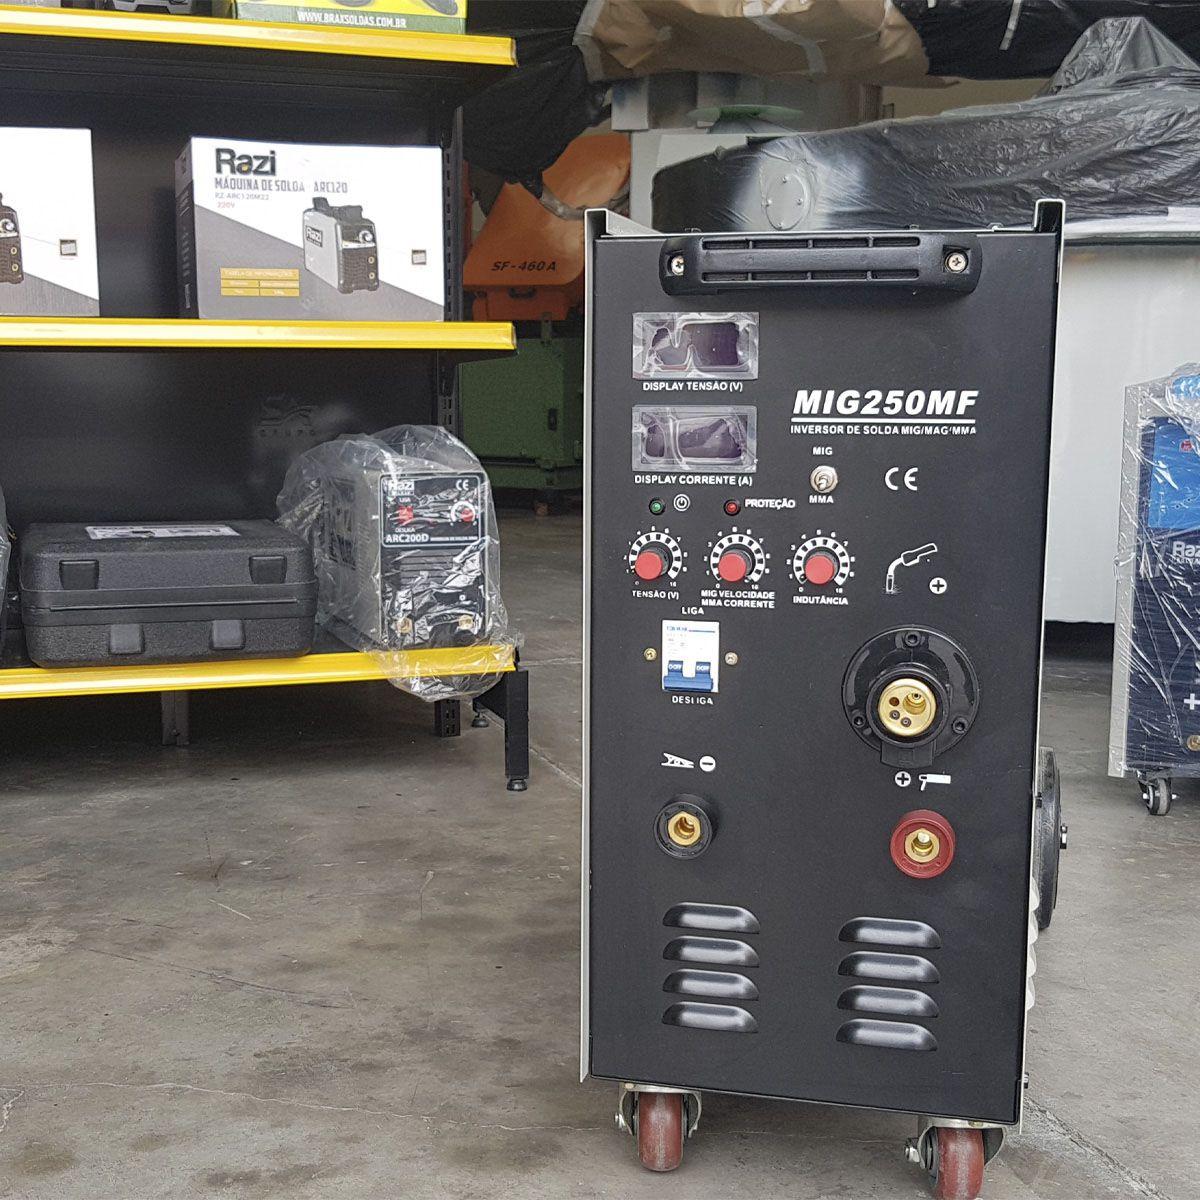 Inversora de Solda MIG 250MF Multifunção - Razi